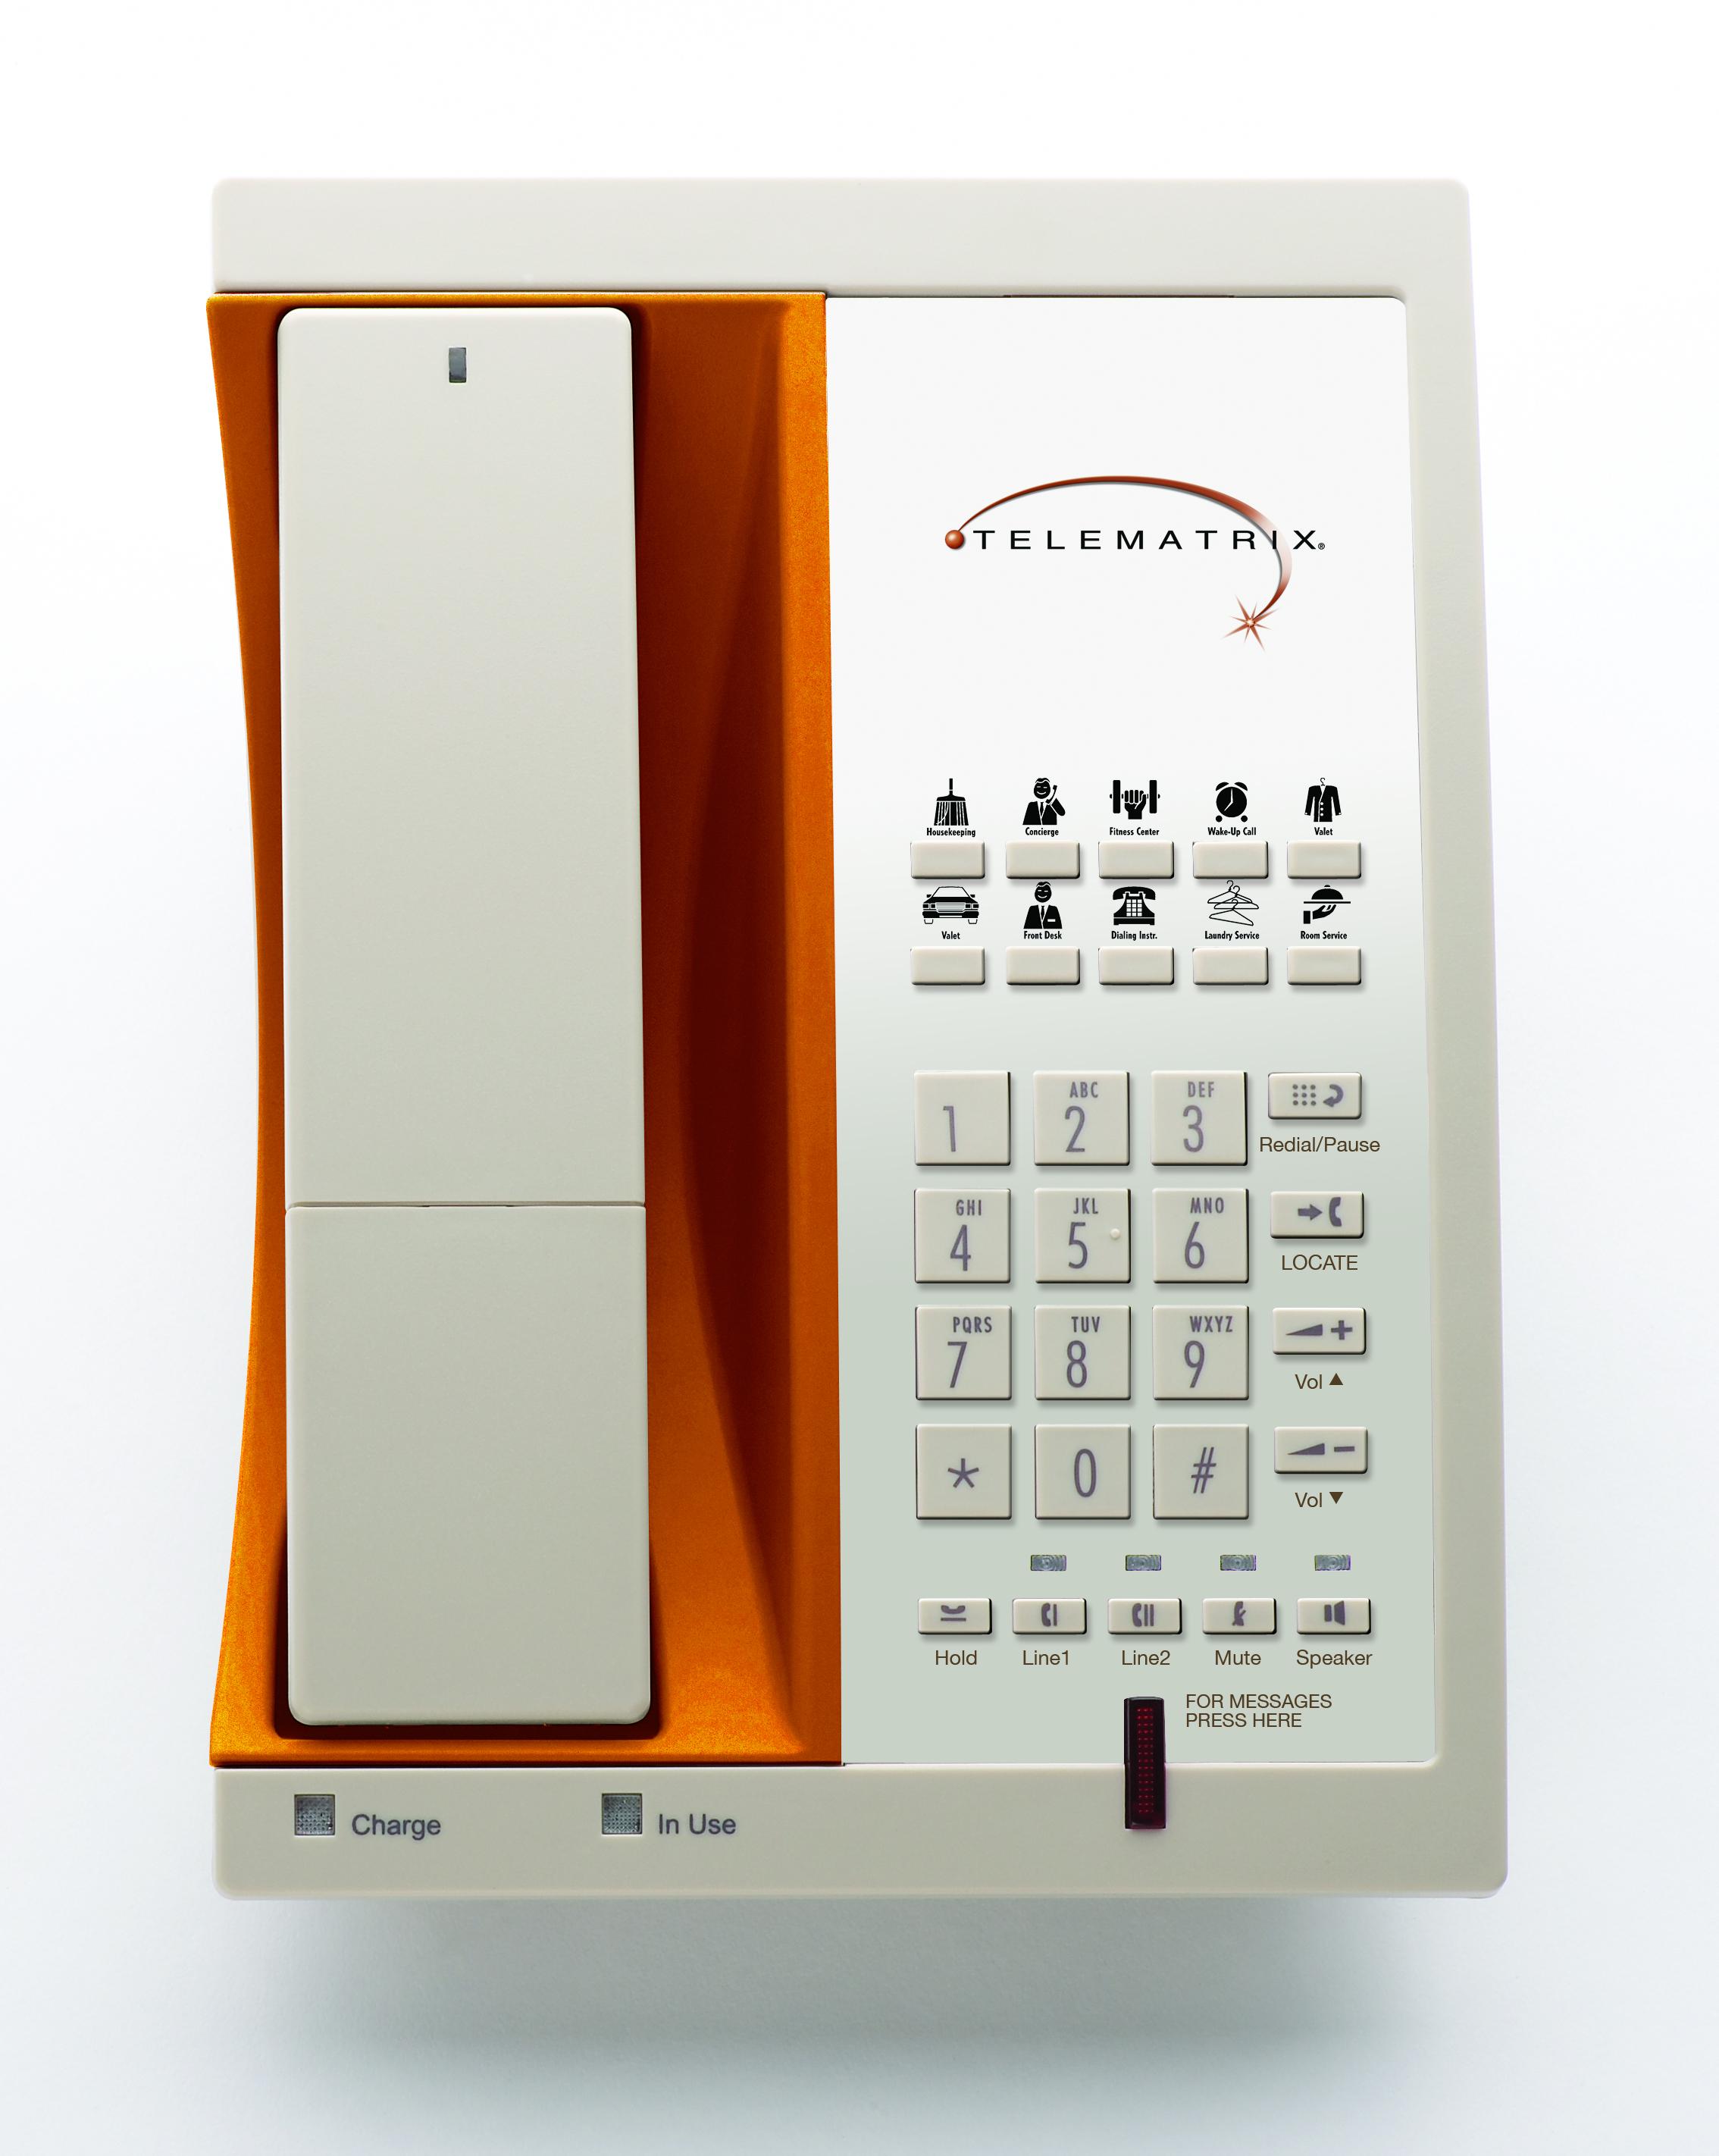 9602MWD_ash-orange.jpg